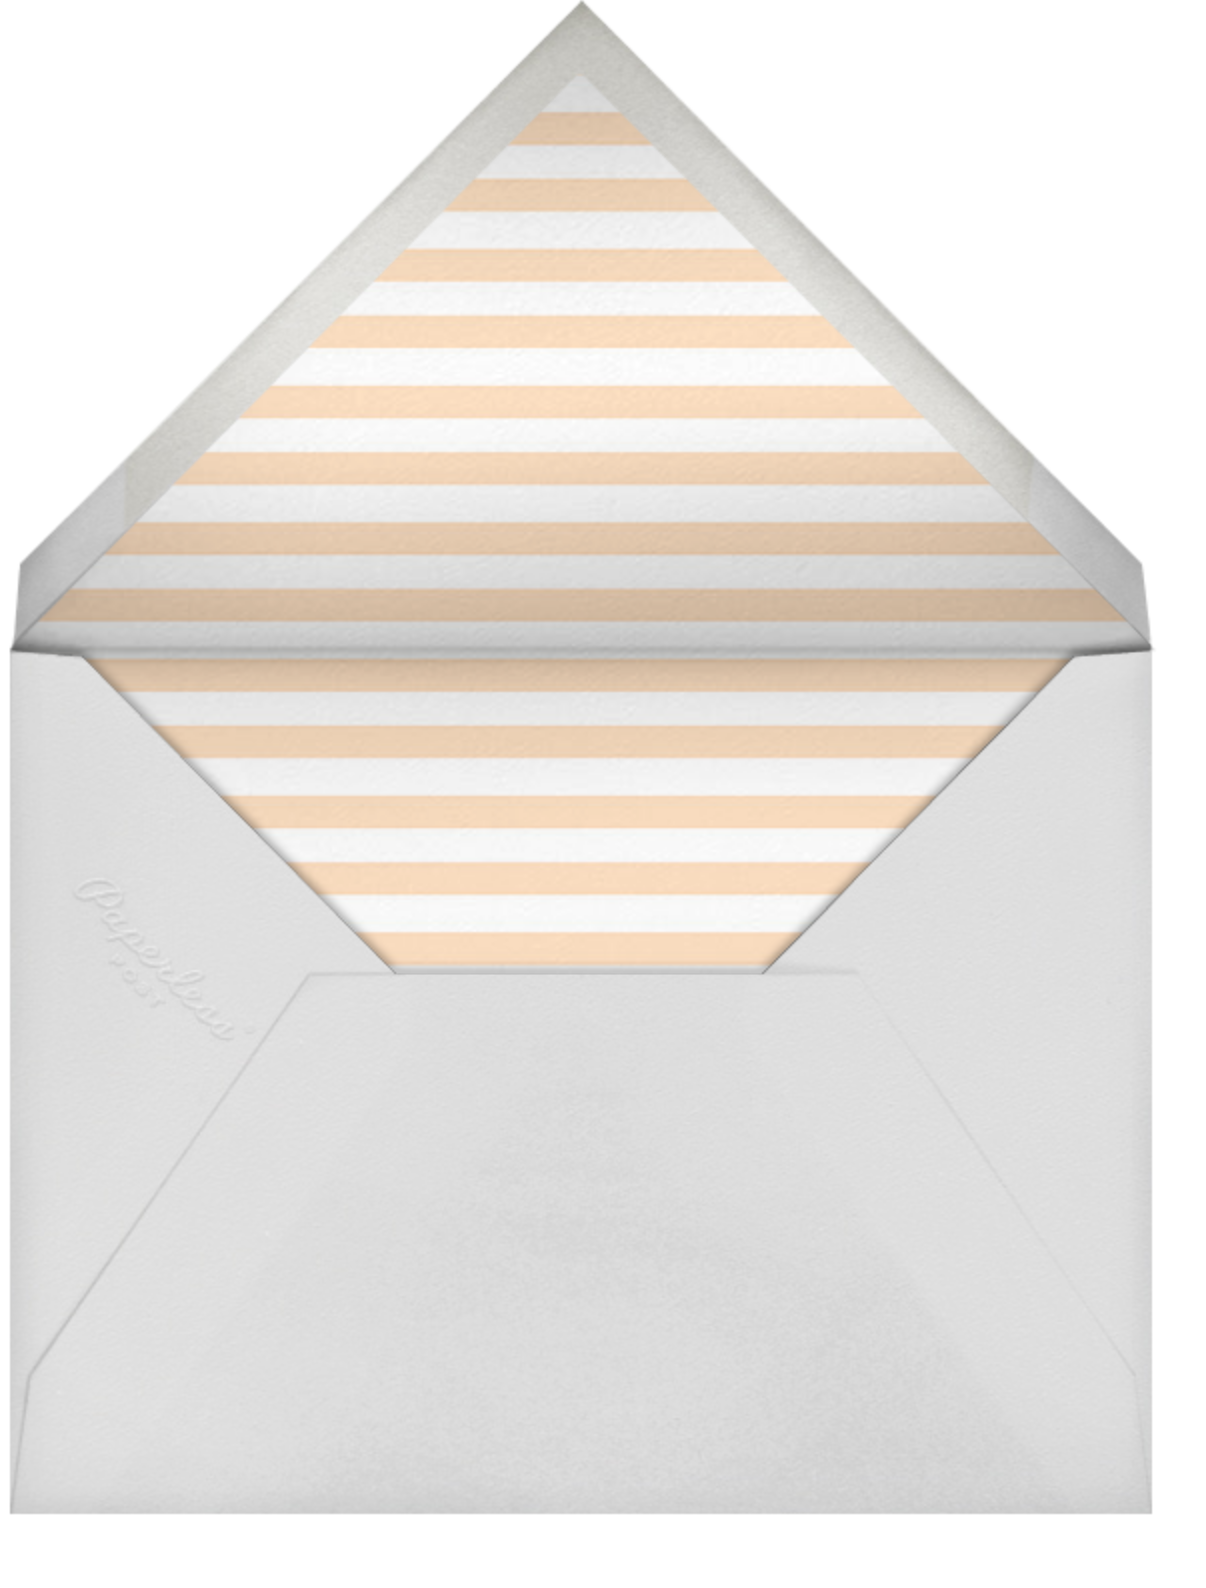 Baby Flurry - Pink - Sugar Paper - Baby shower - envelope back